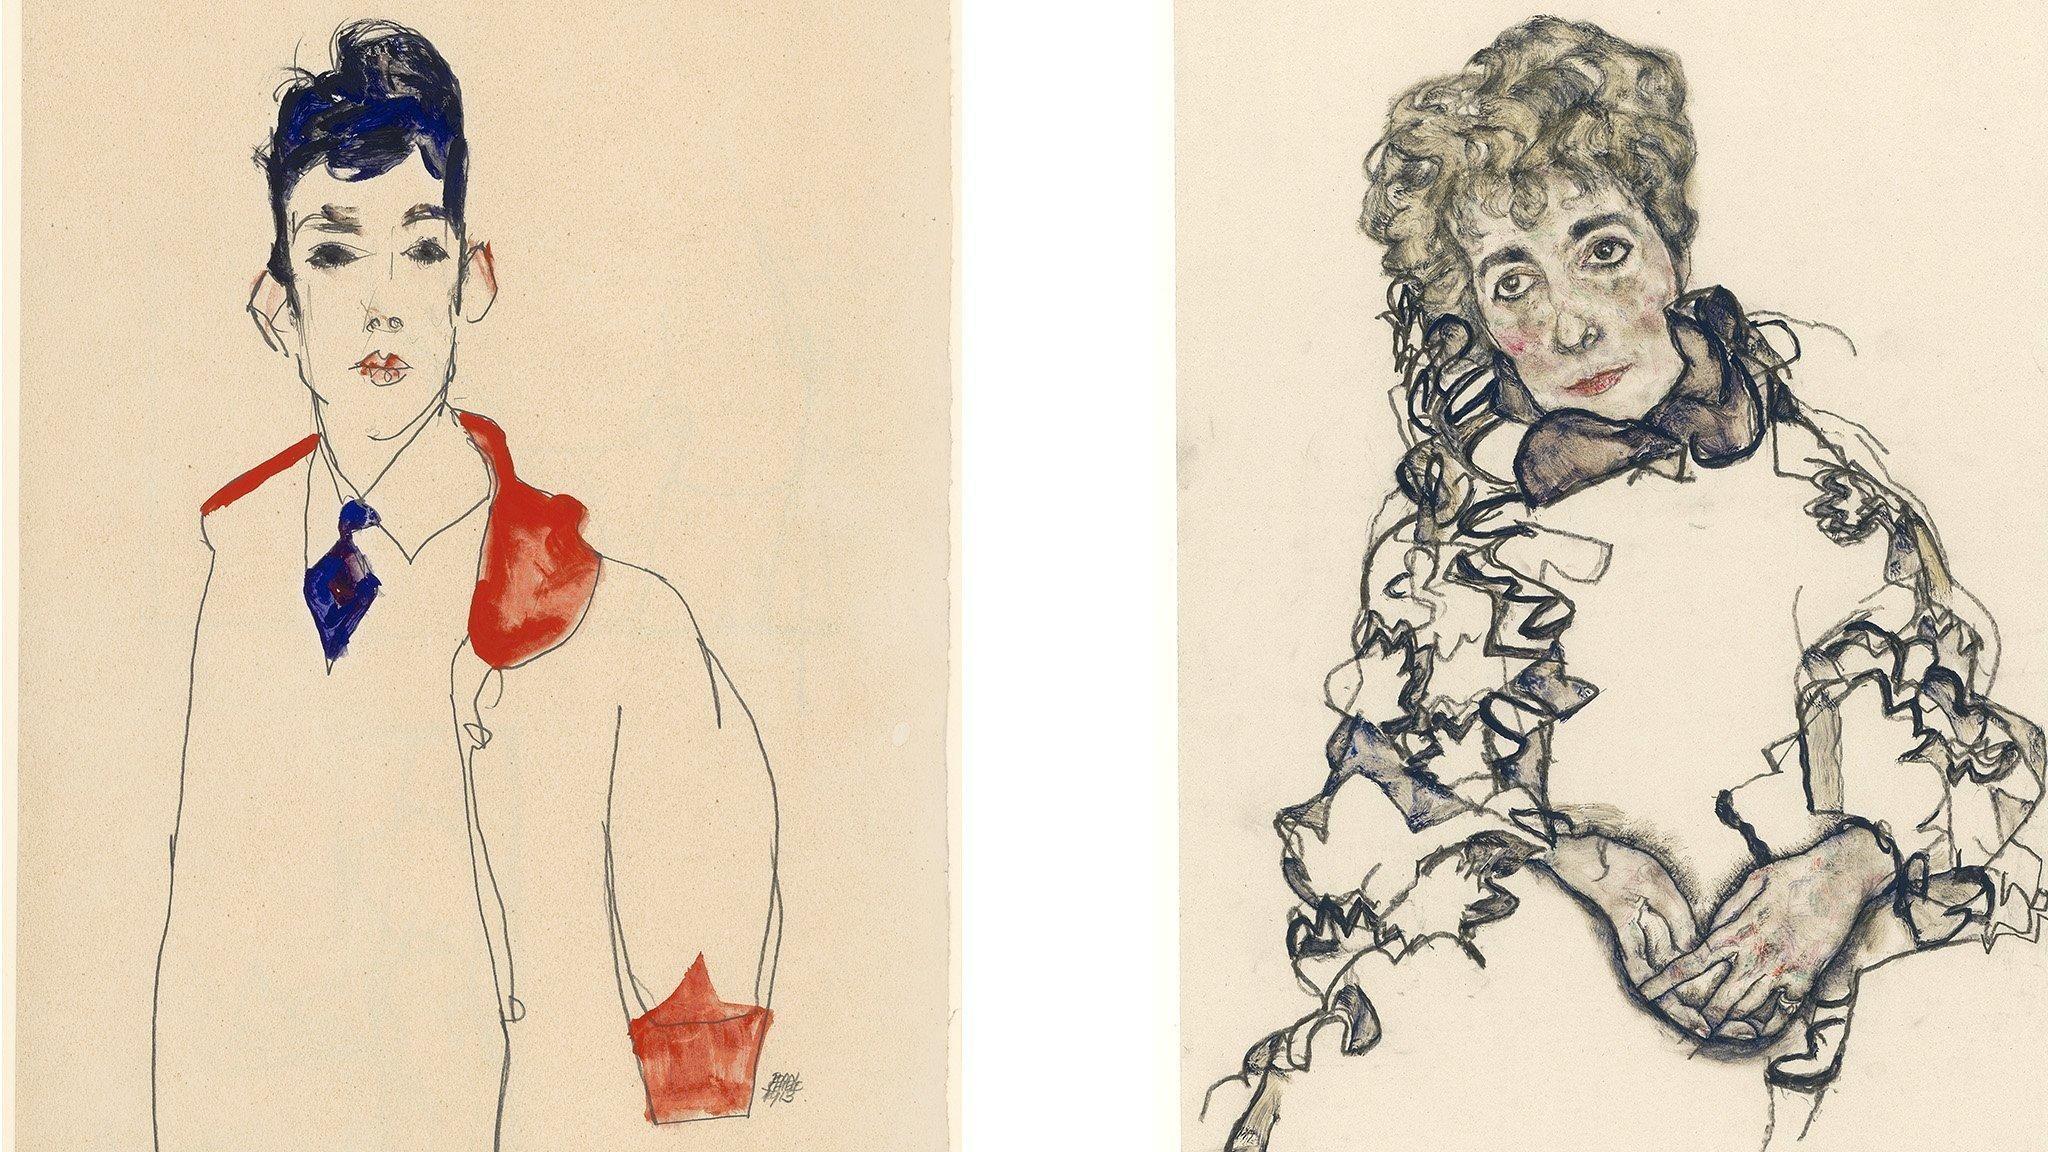 2048x1152 Egon Schiele: Chân dung, Neue Galerie, New York - đánh giá